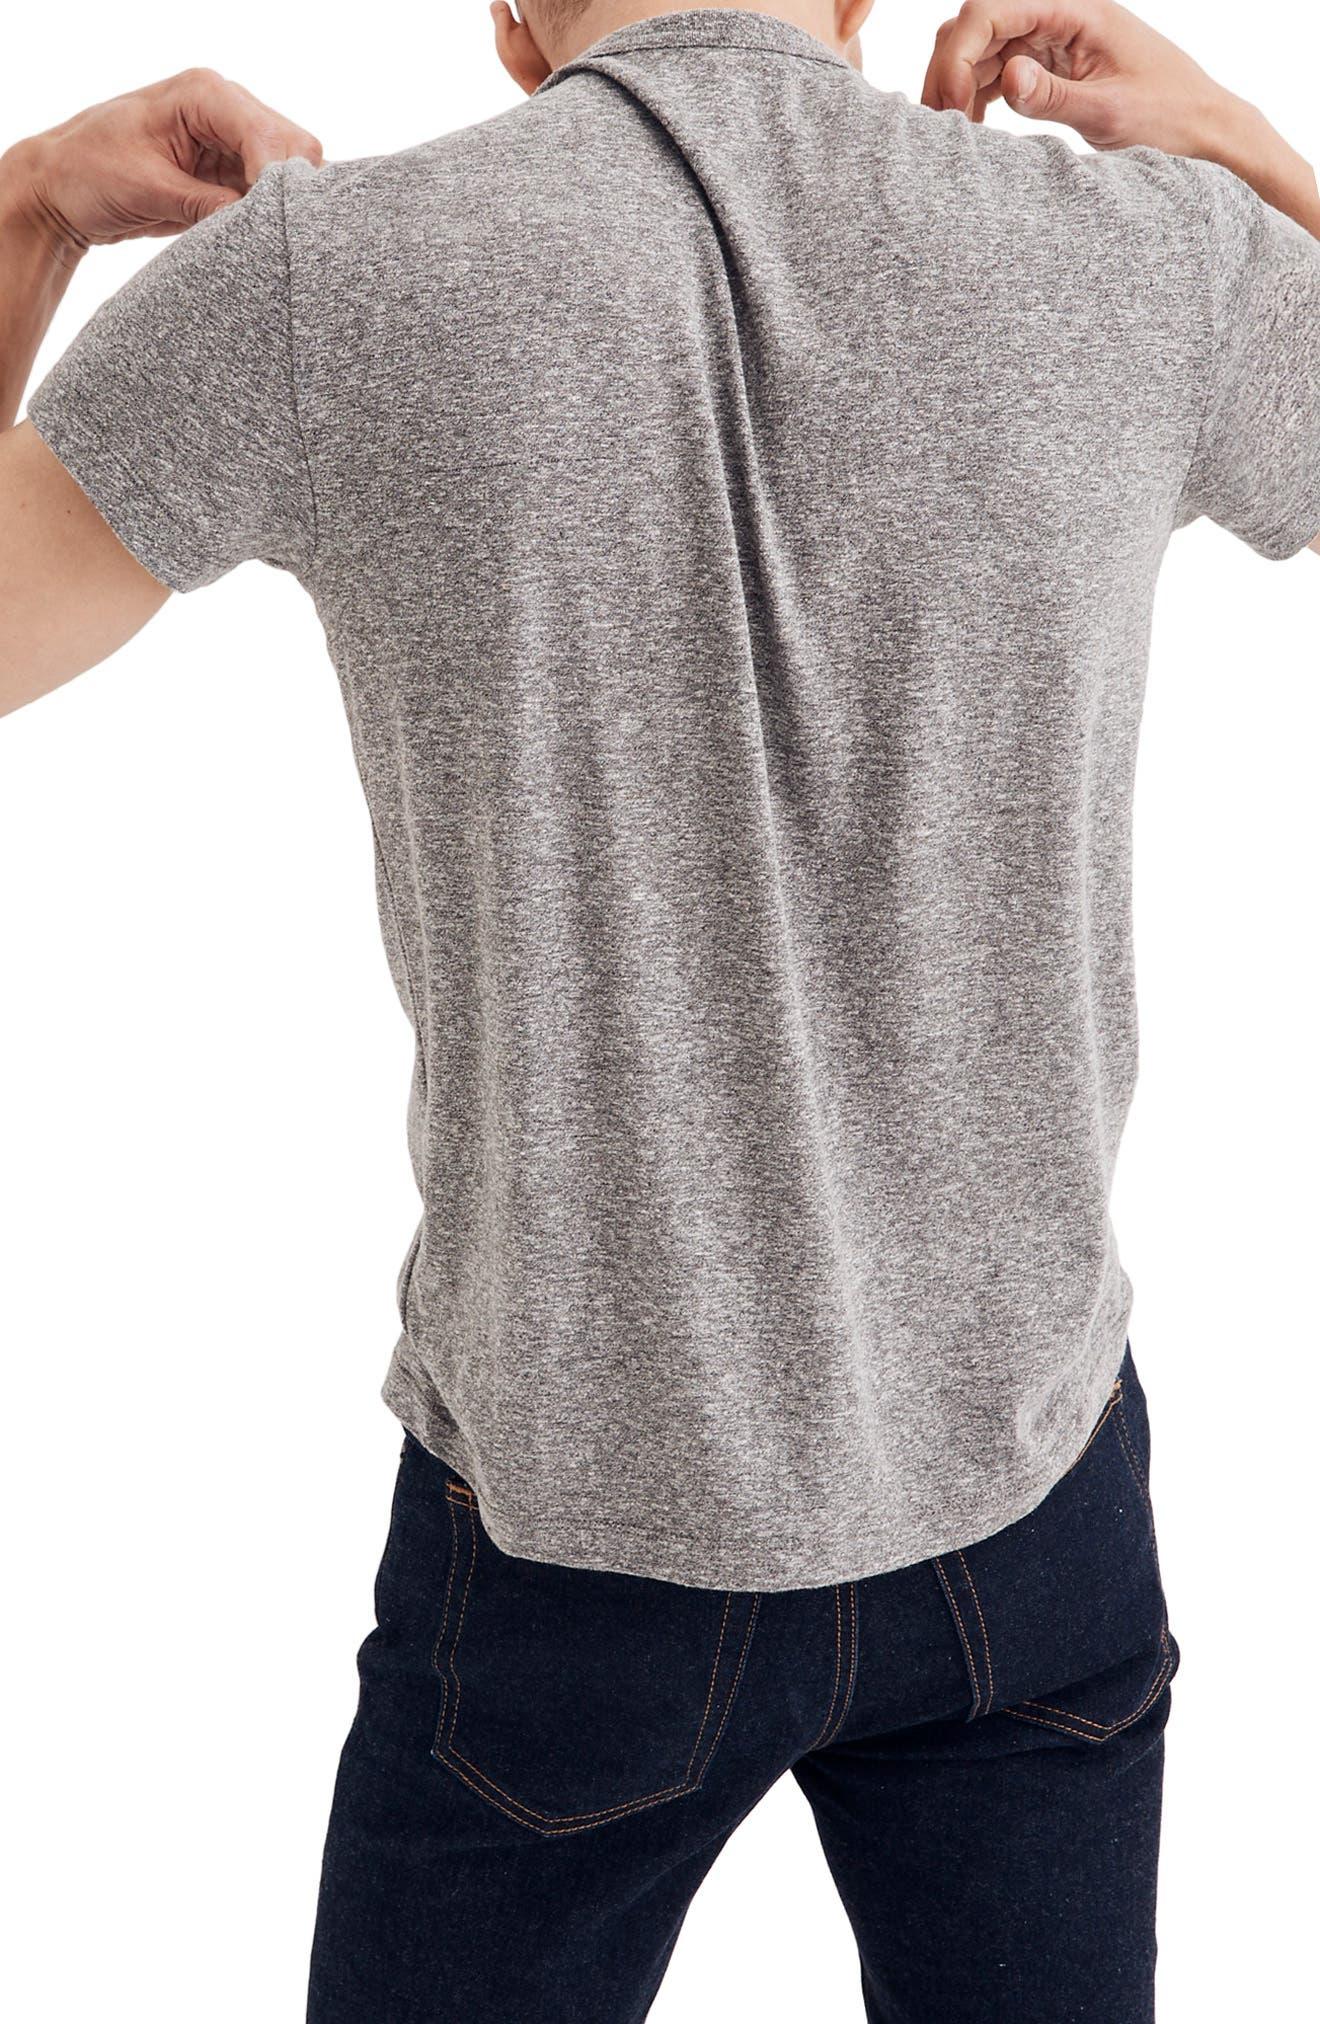 MADEWELL,                             Crewneck T-Shirt,                             Alternate thumbnail 2, color,                             HEATHER GREY